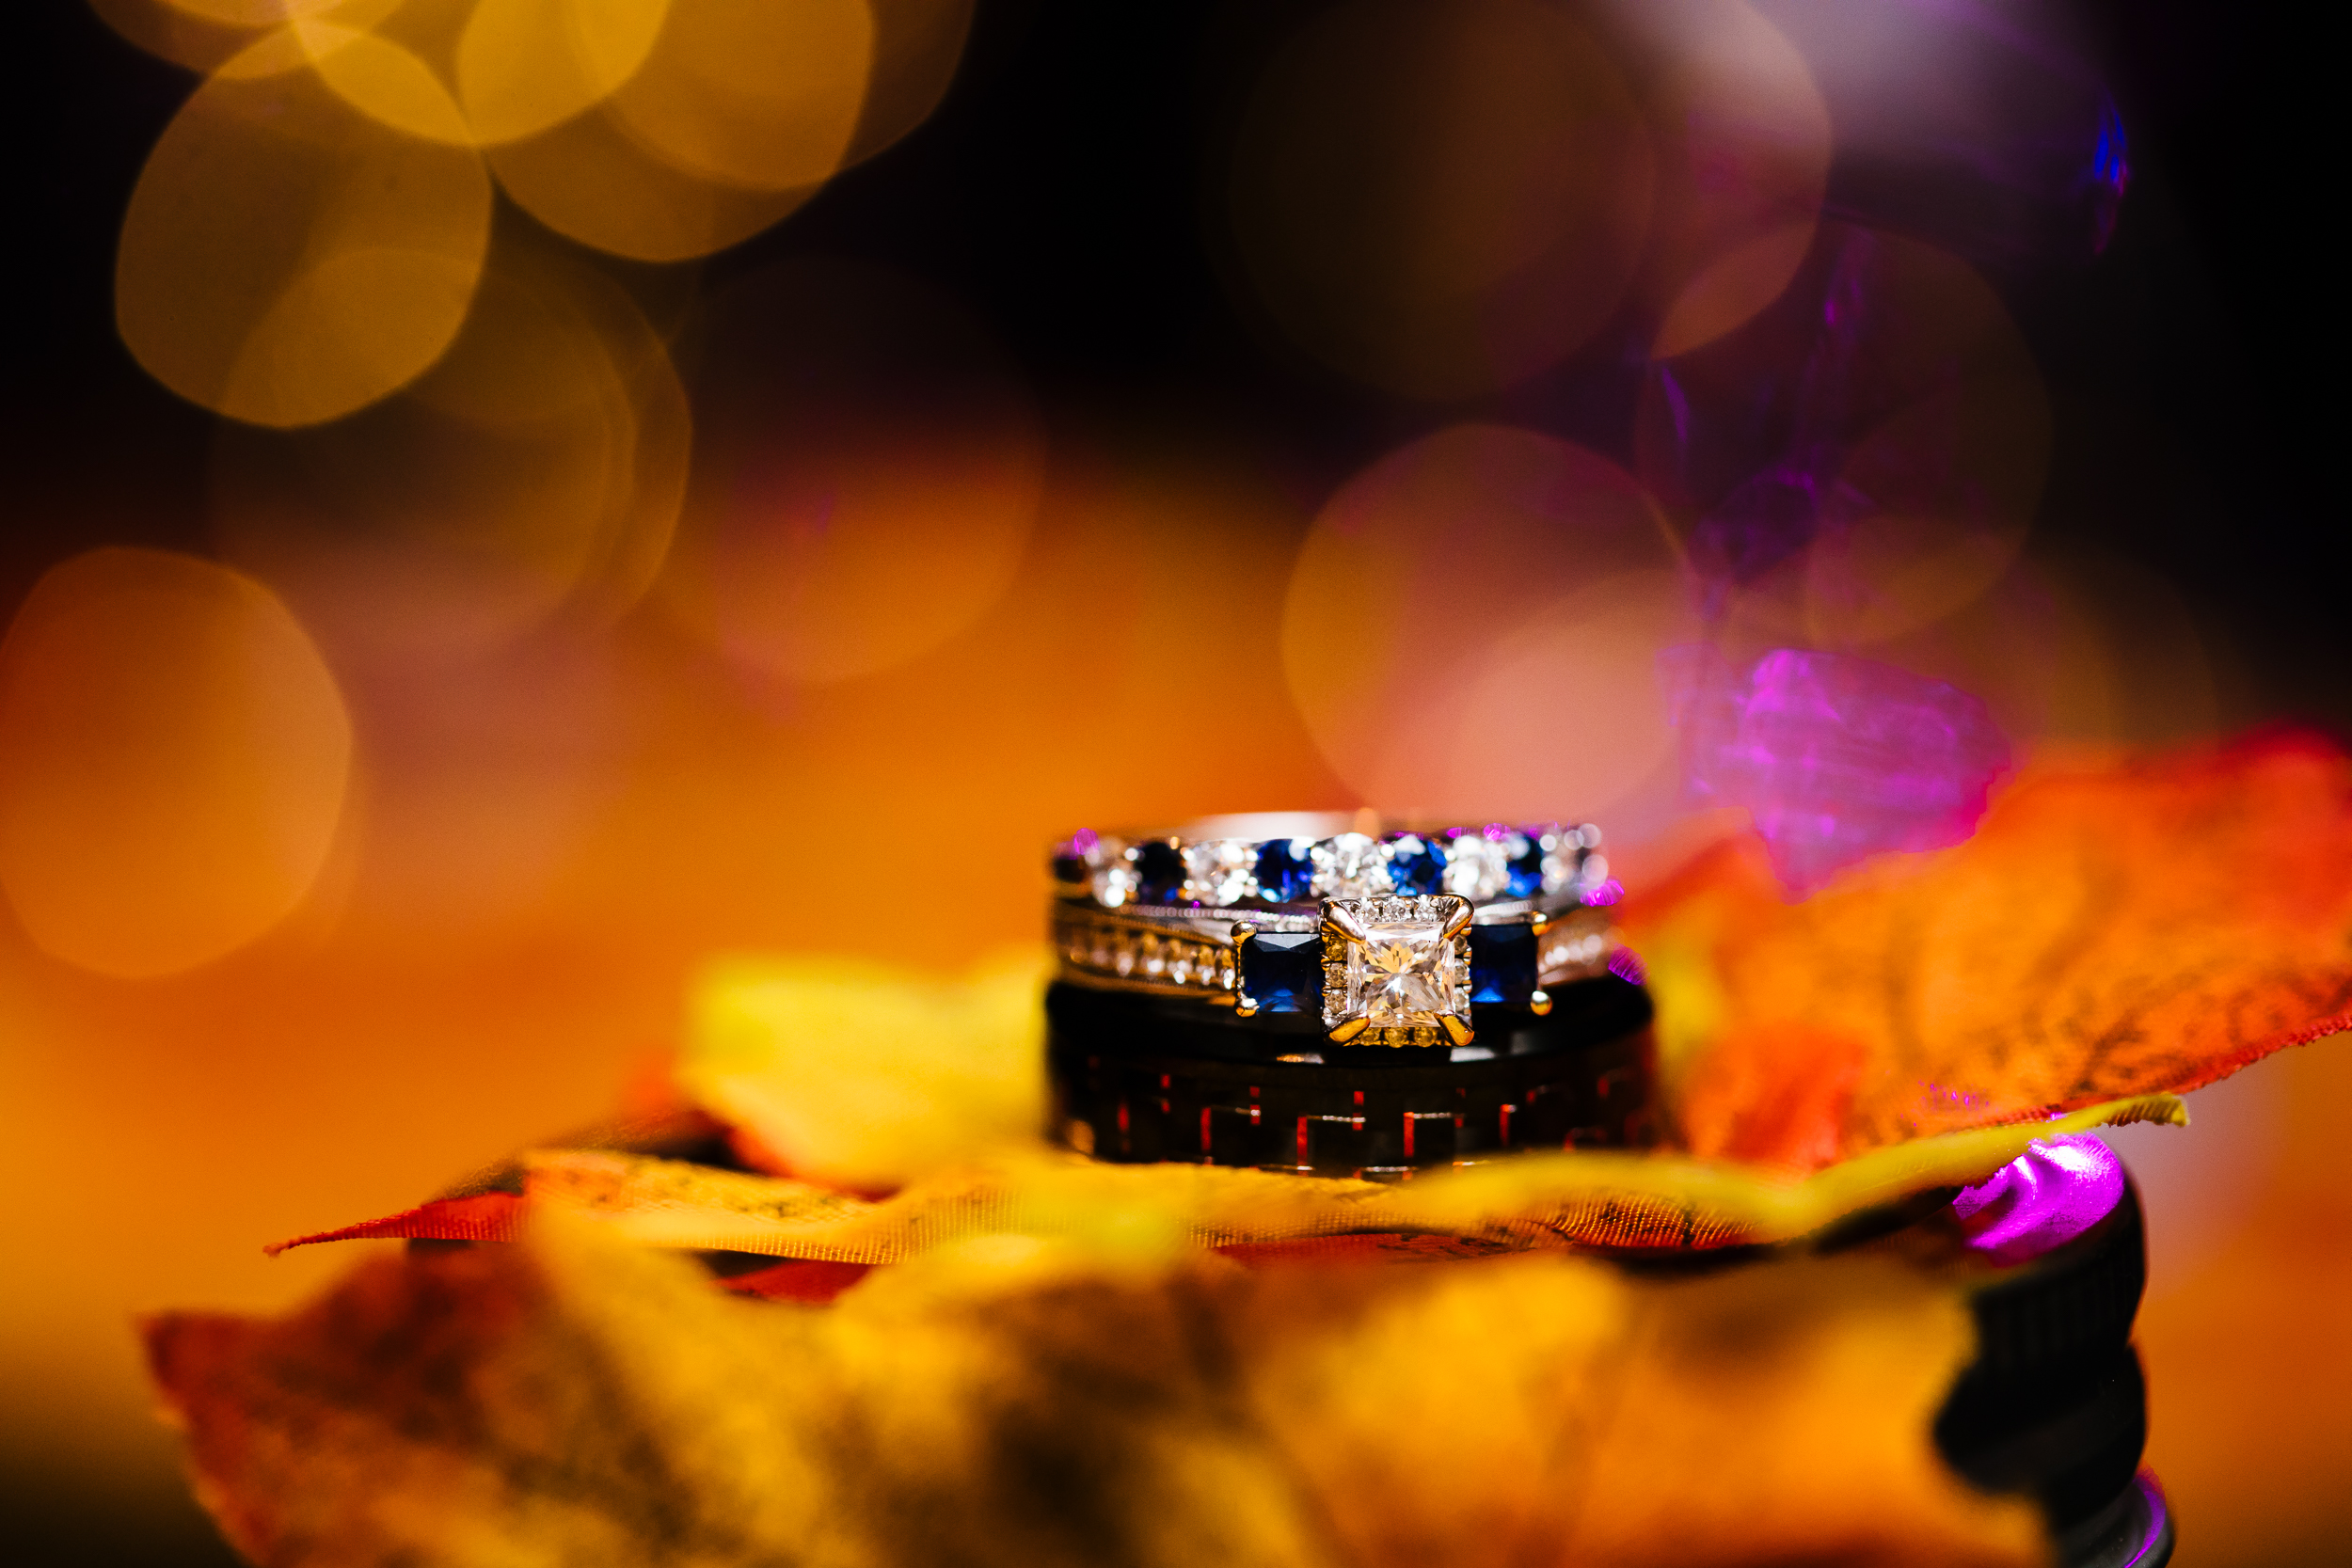 Sapphire and diamond wedding rings.